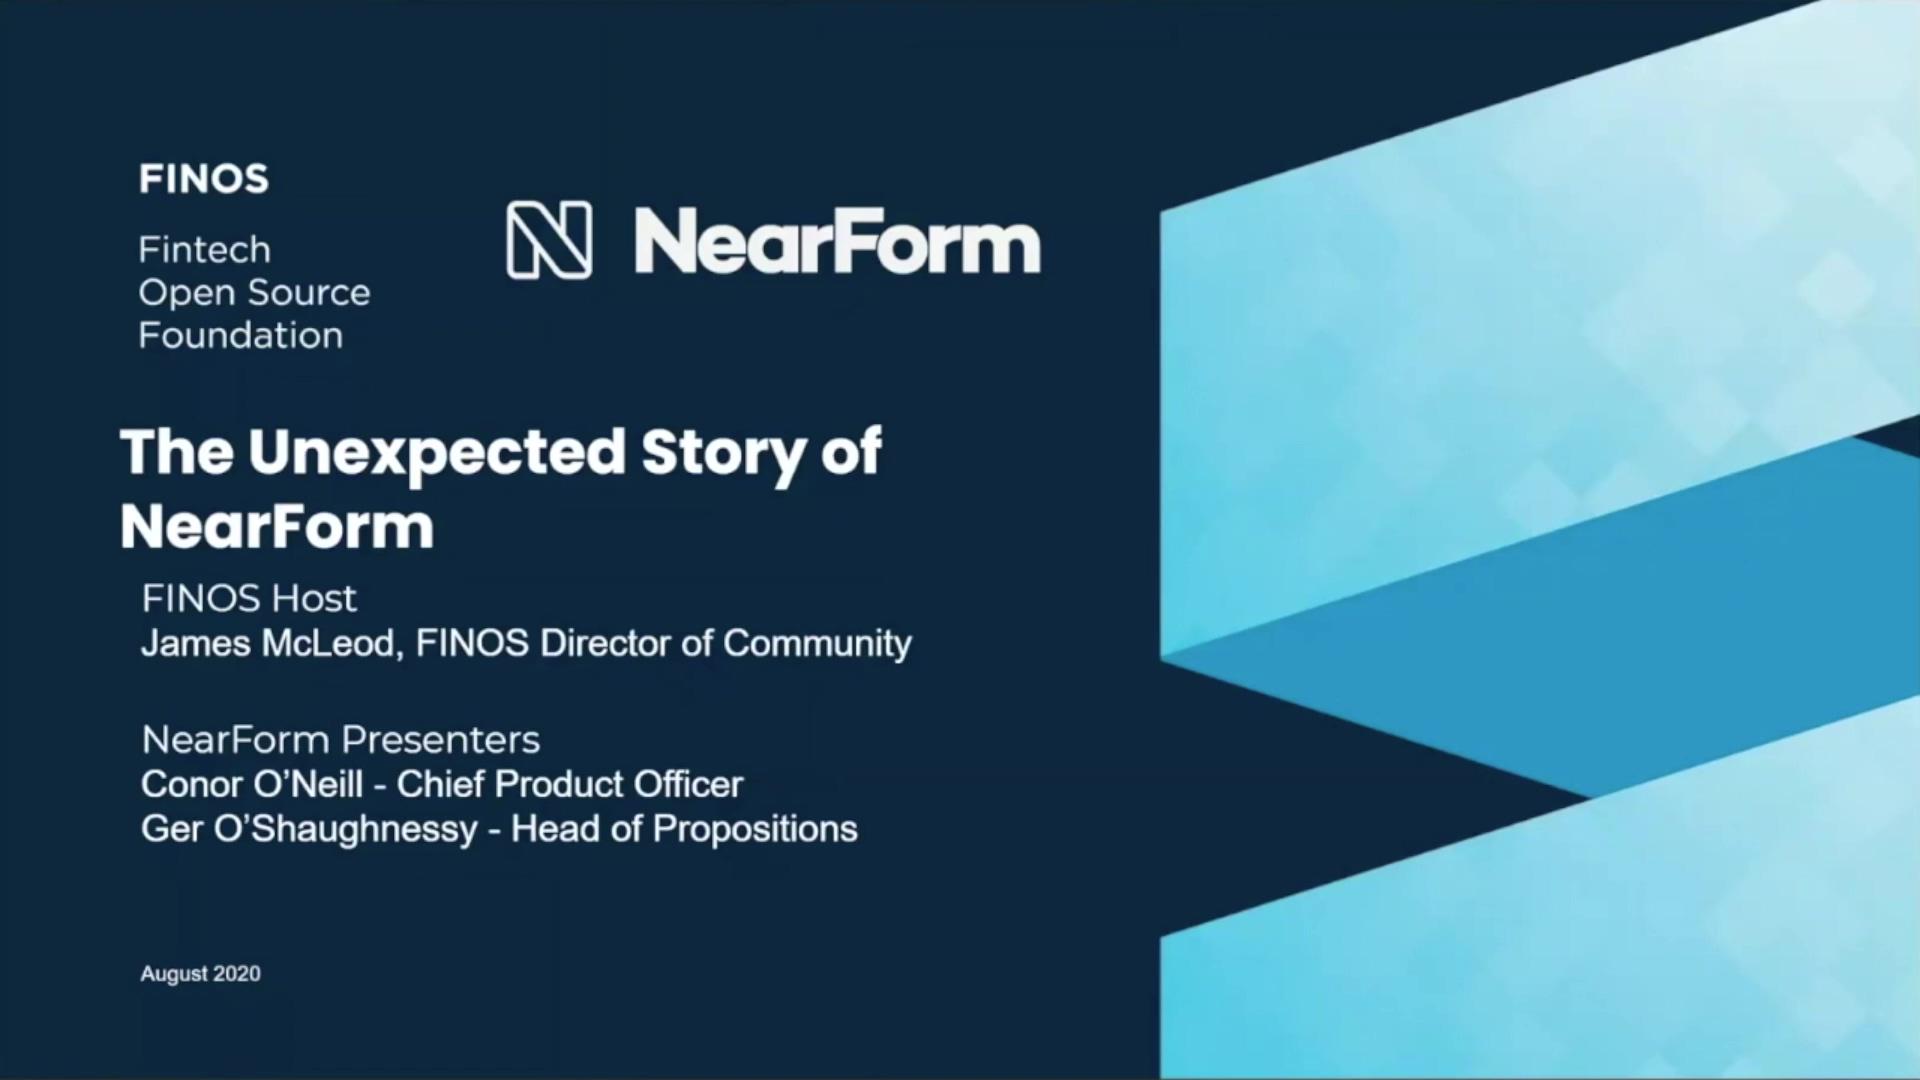 FINOS Meetup - Nearform - 26 Aug 20